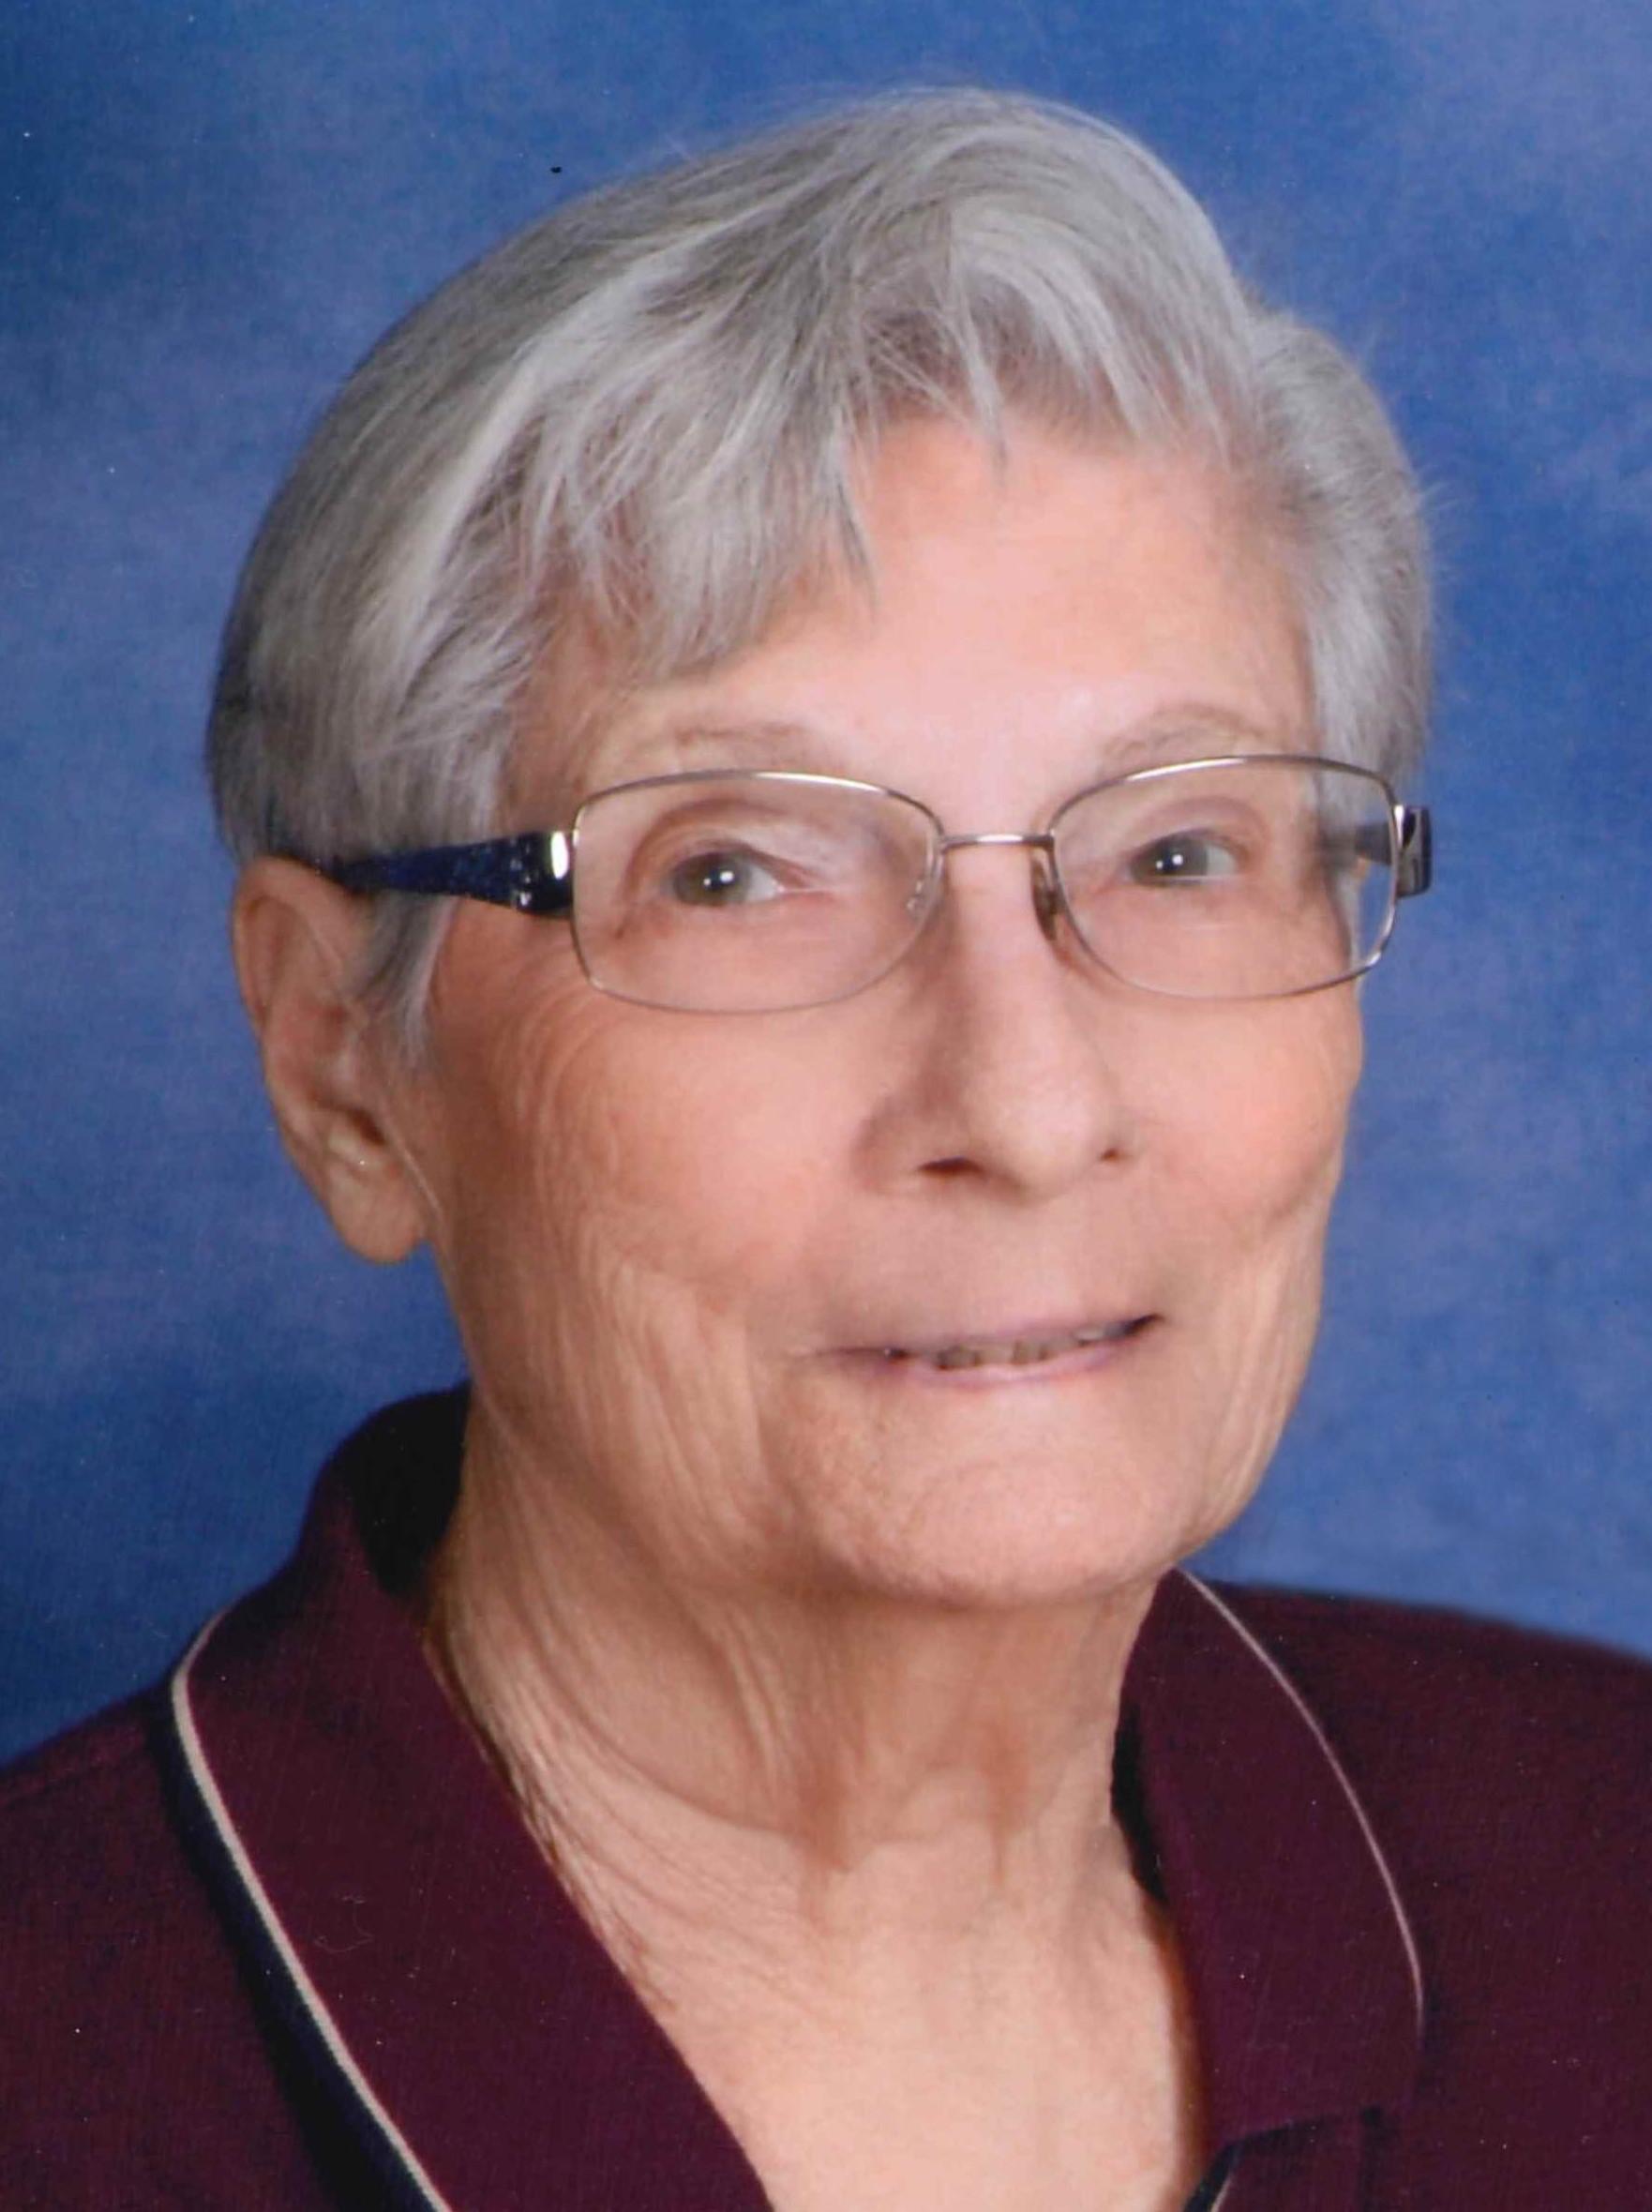 Carolyn Maxine Reddish, 94 years of age, of Holdrege